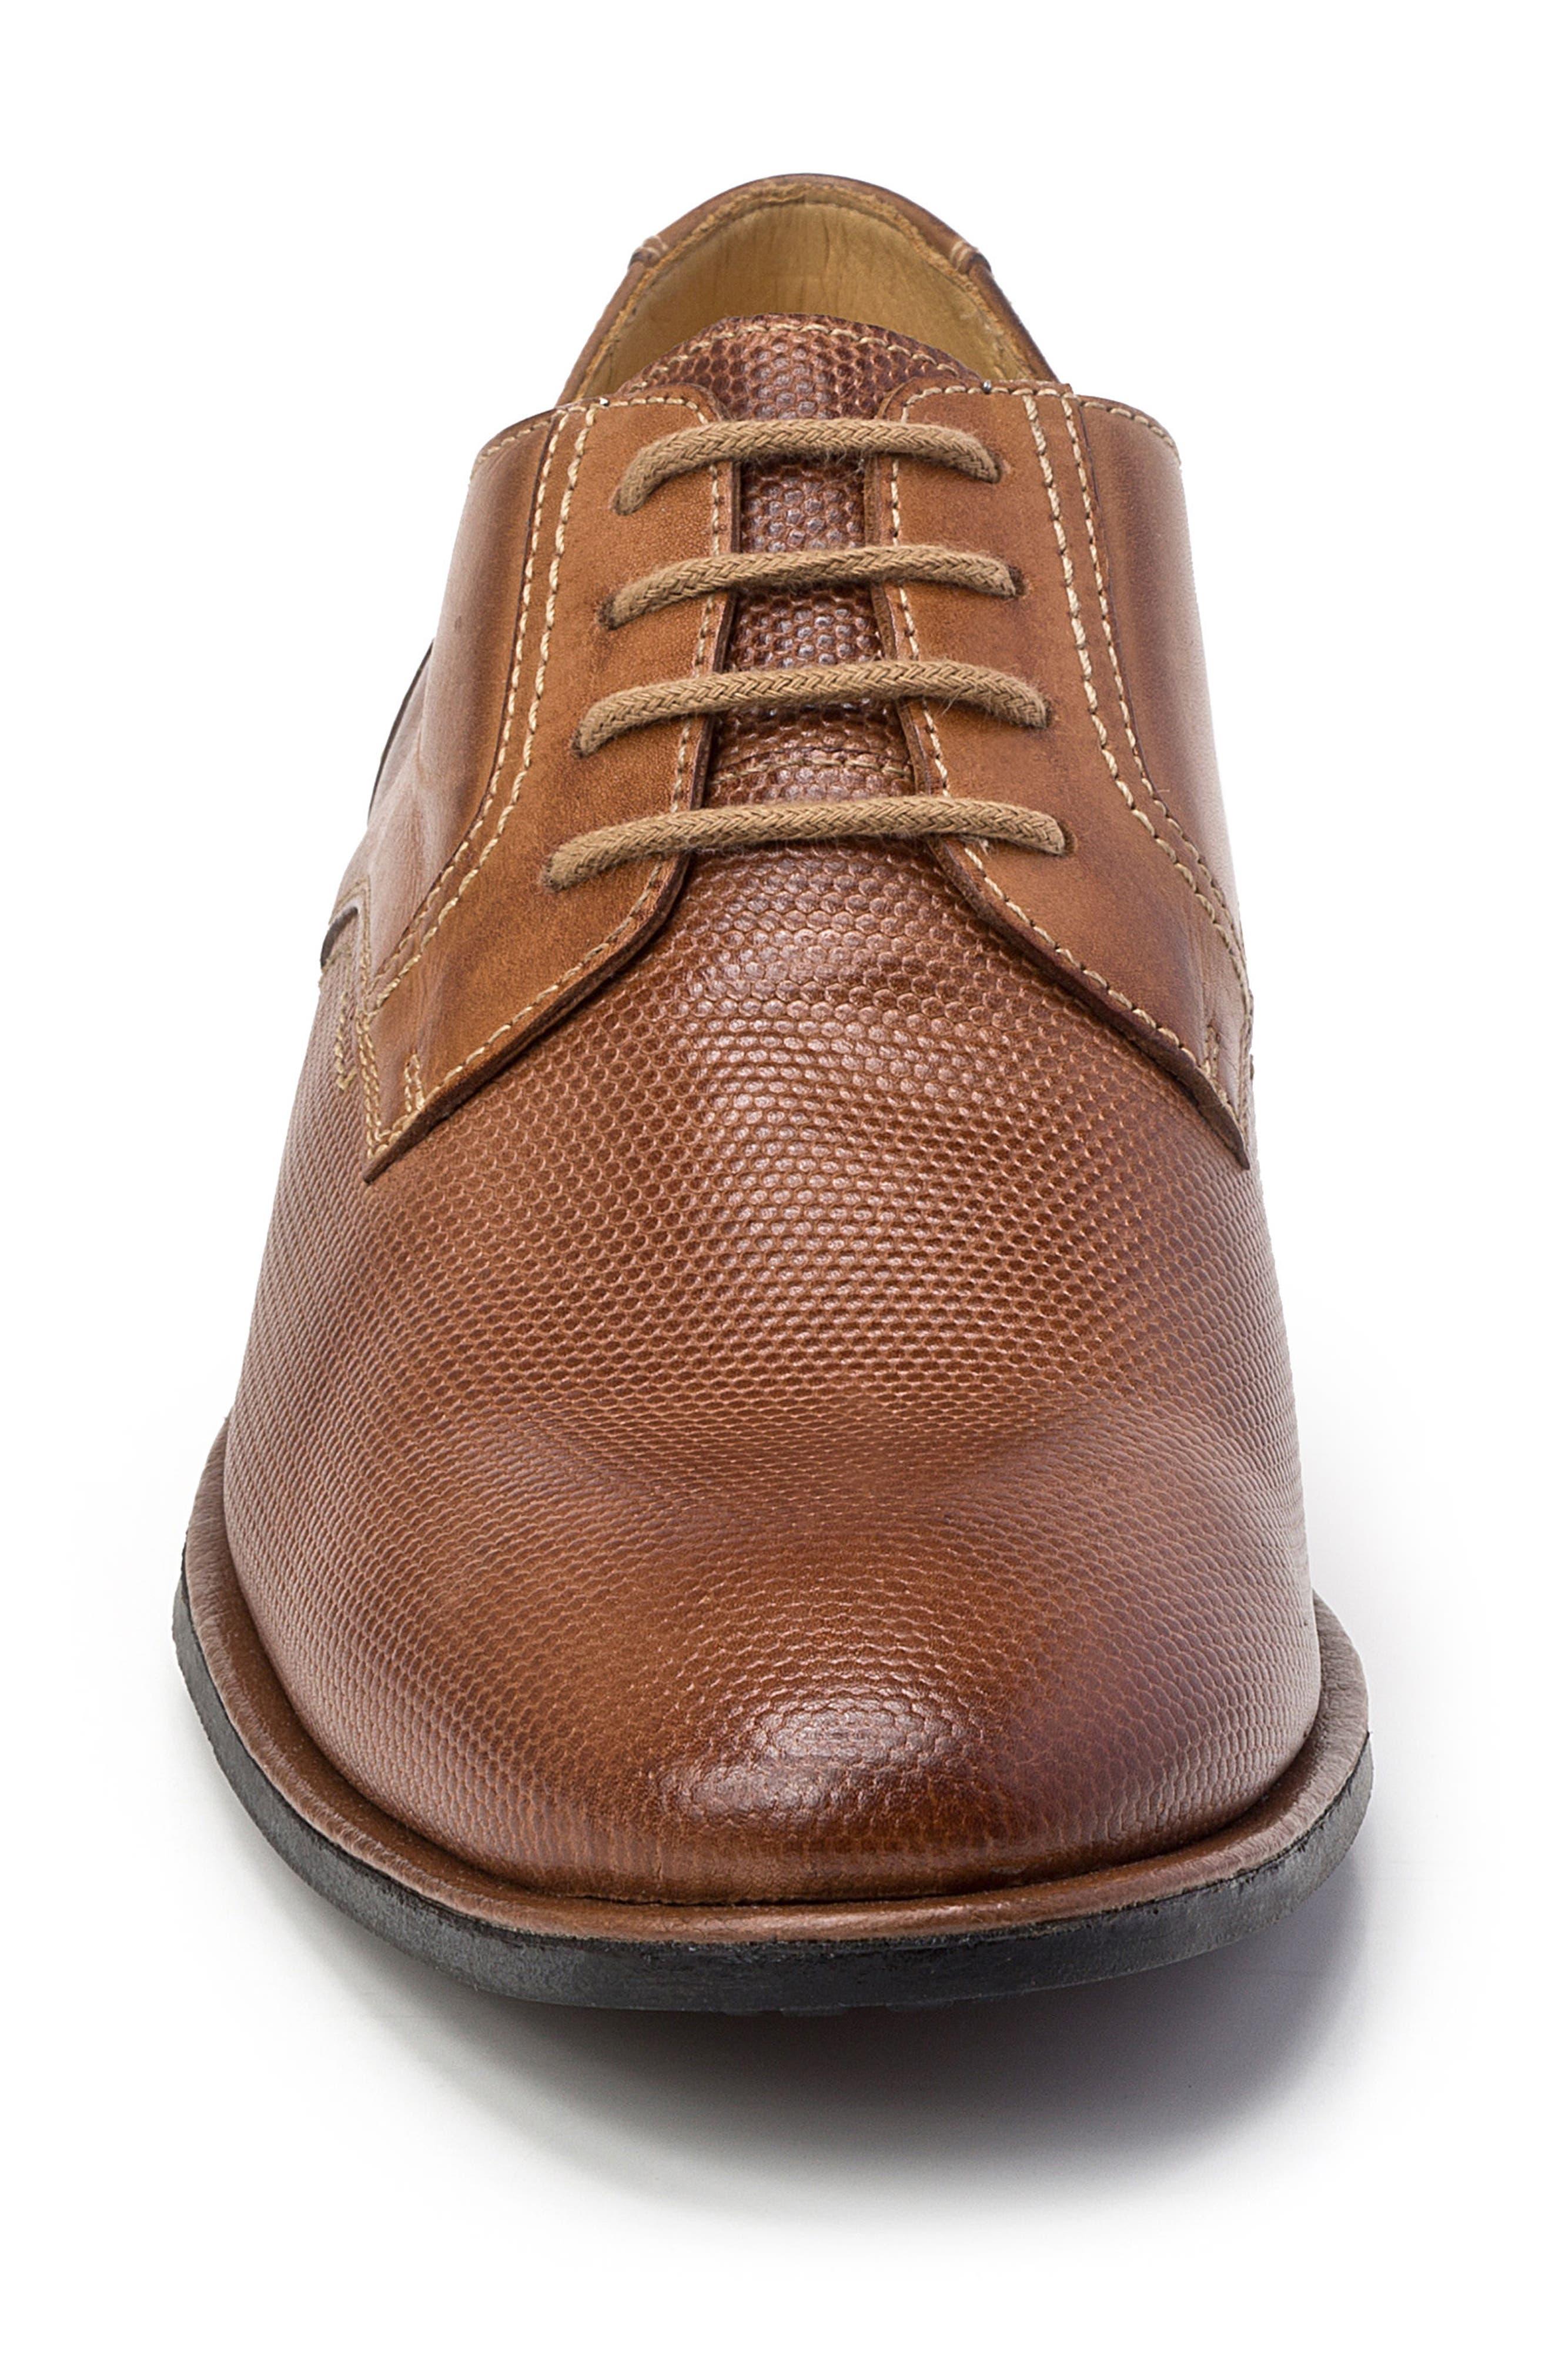 Trenso Plain Toe Derby,                             Alternate thumbnail 5, color,                             Tan Leather